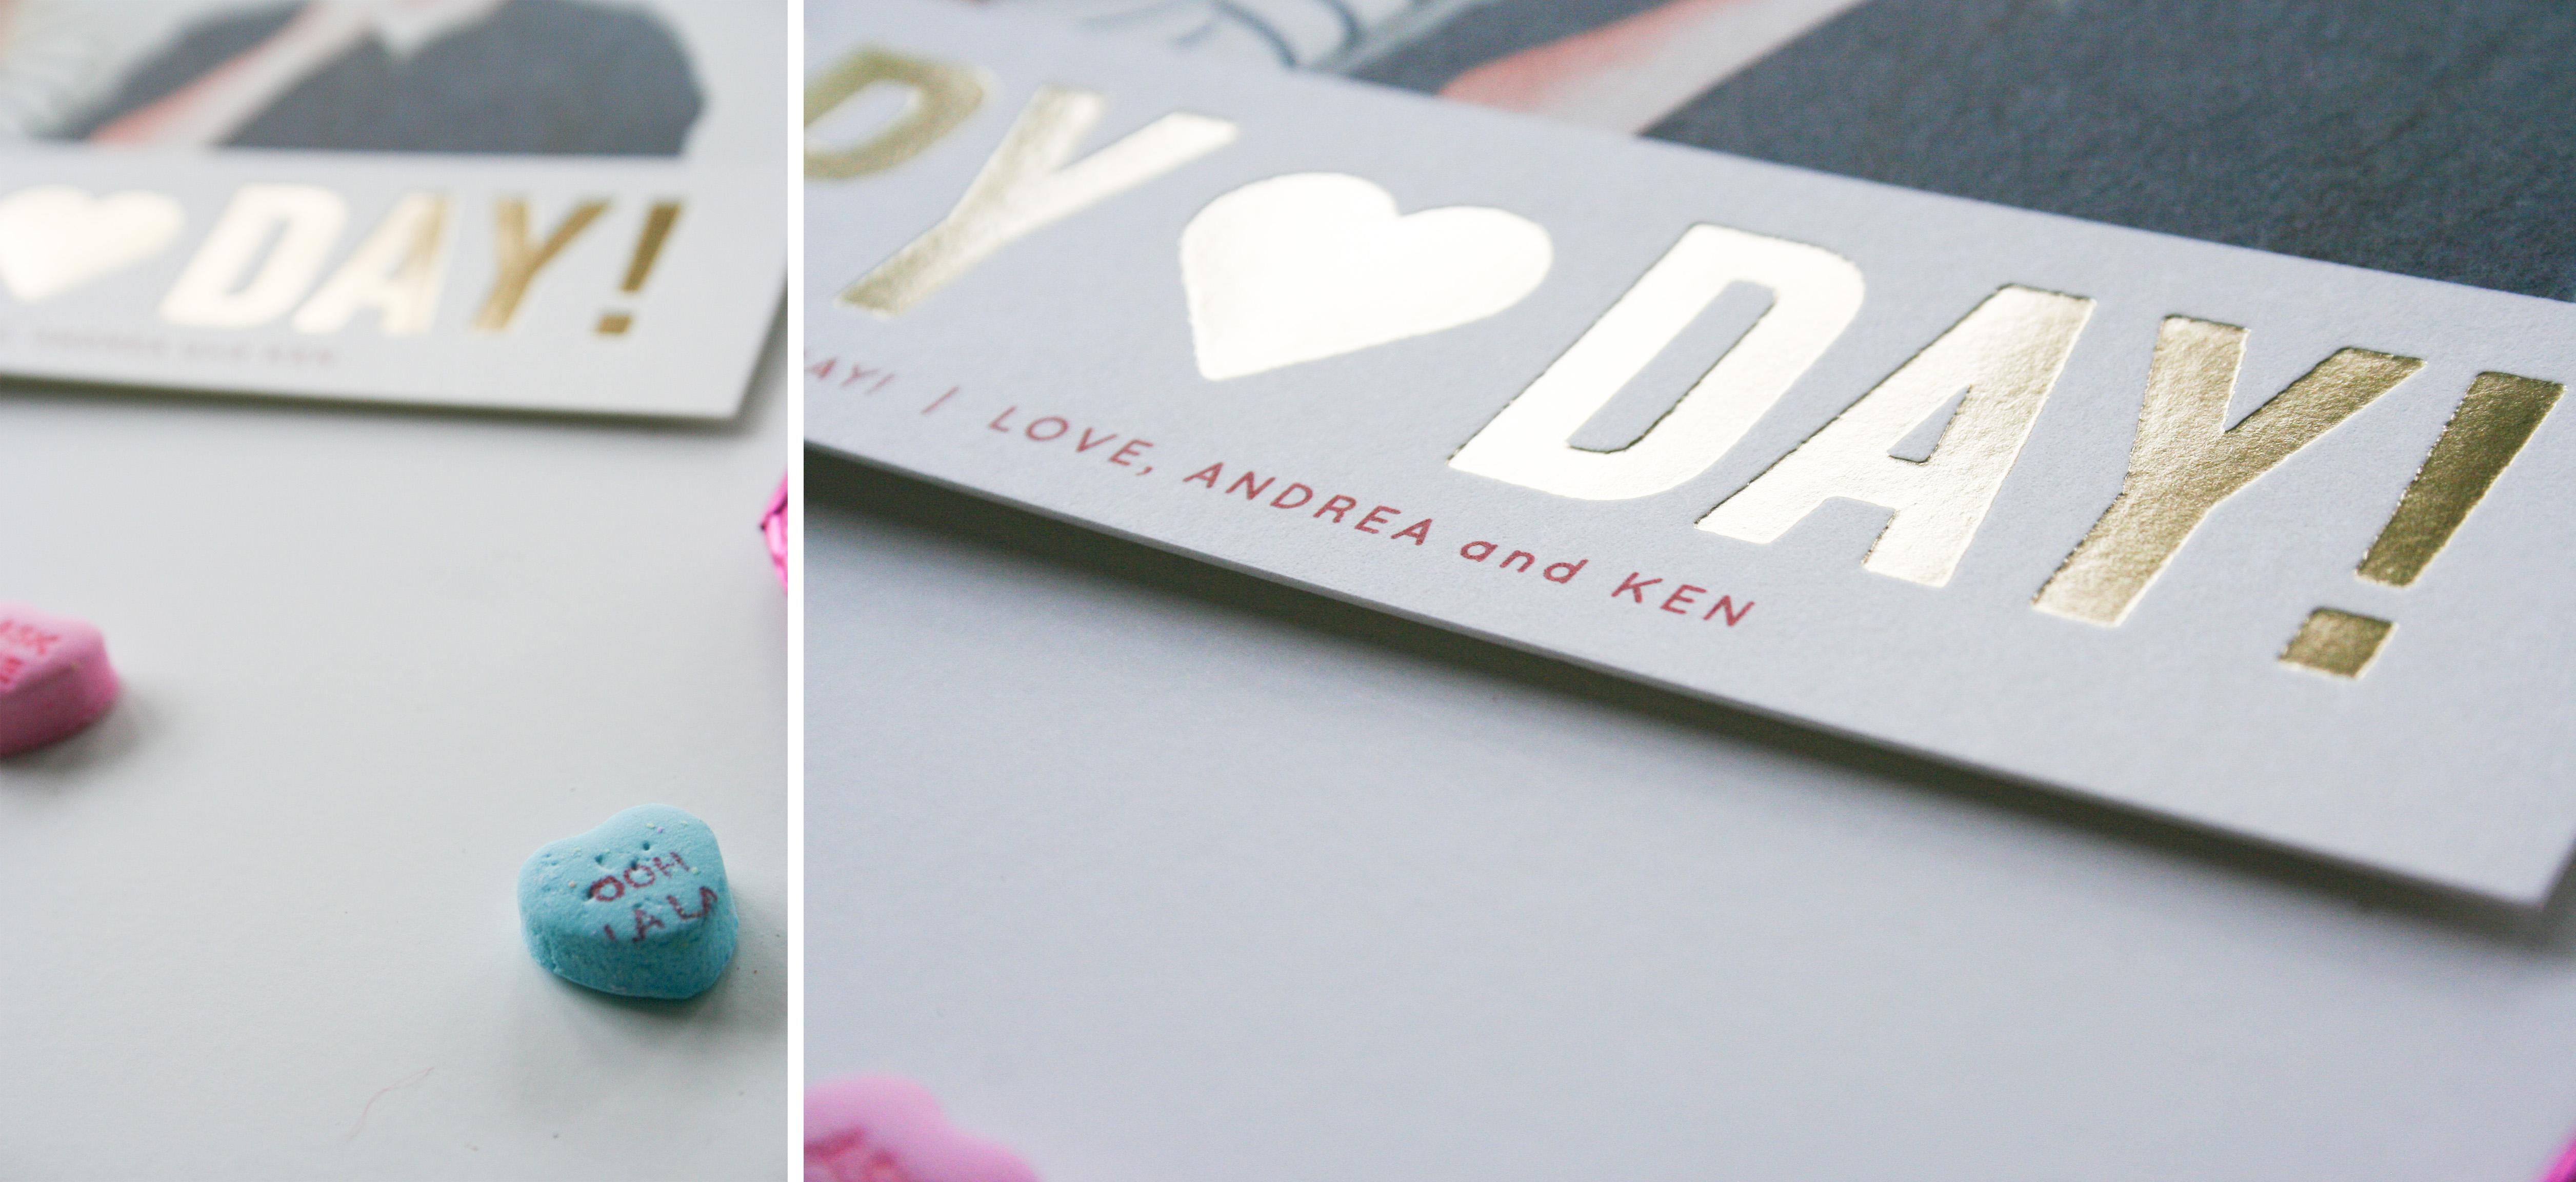 Julia Child Valentines Day Cards - Legal Miss SunshineJulia Child Valentines Day Cards - Legal Miss Sunshine